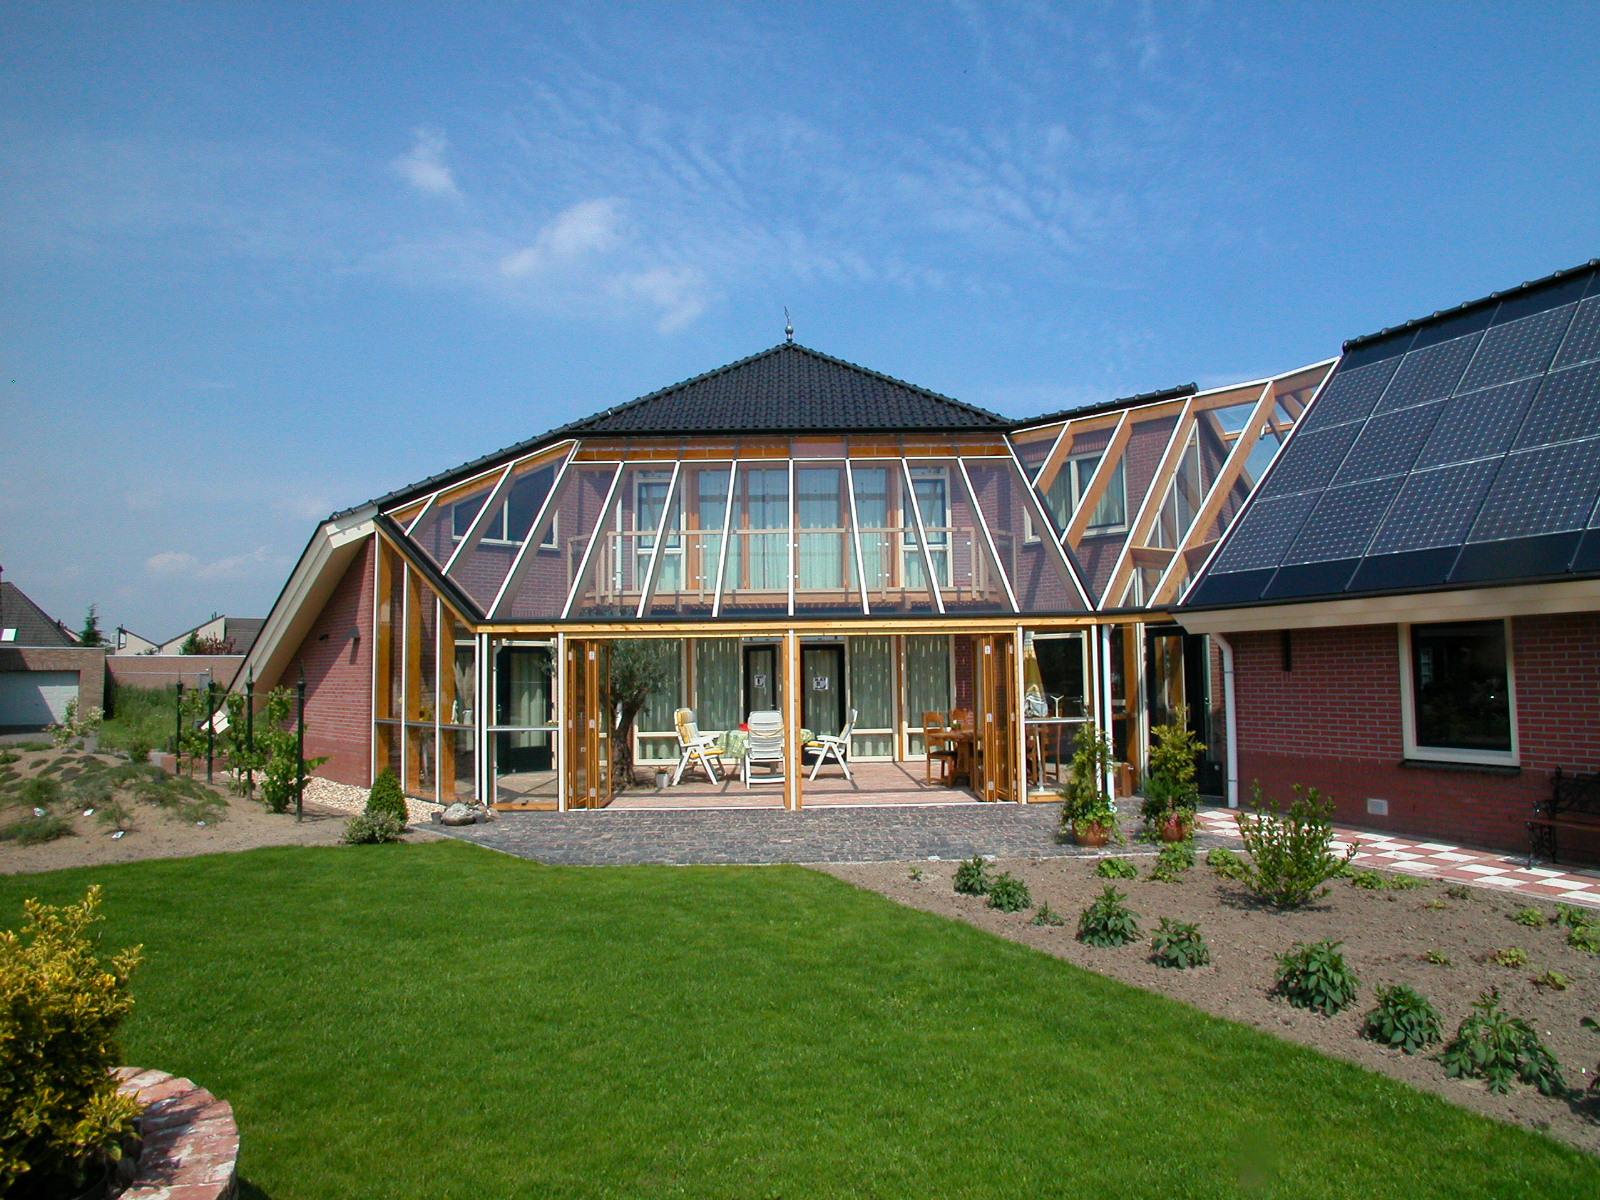 Energie Nul huis Oss  serre voor passieve zonne energie